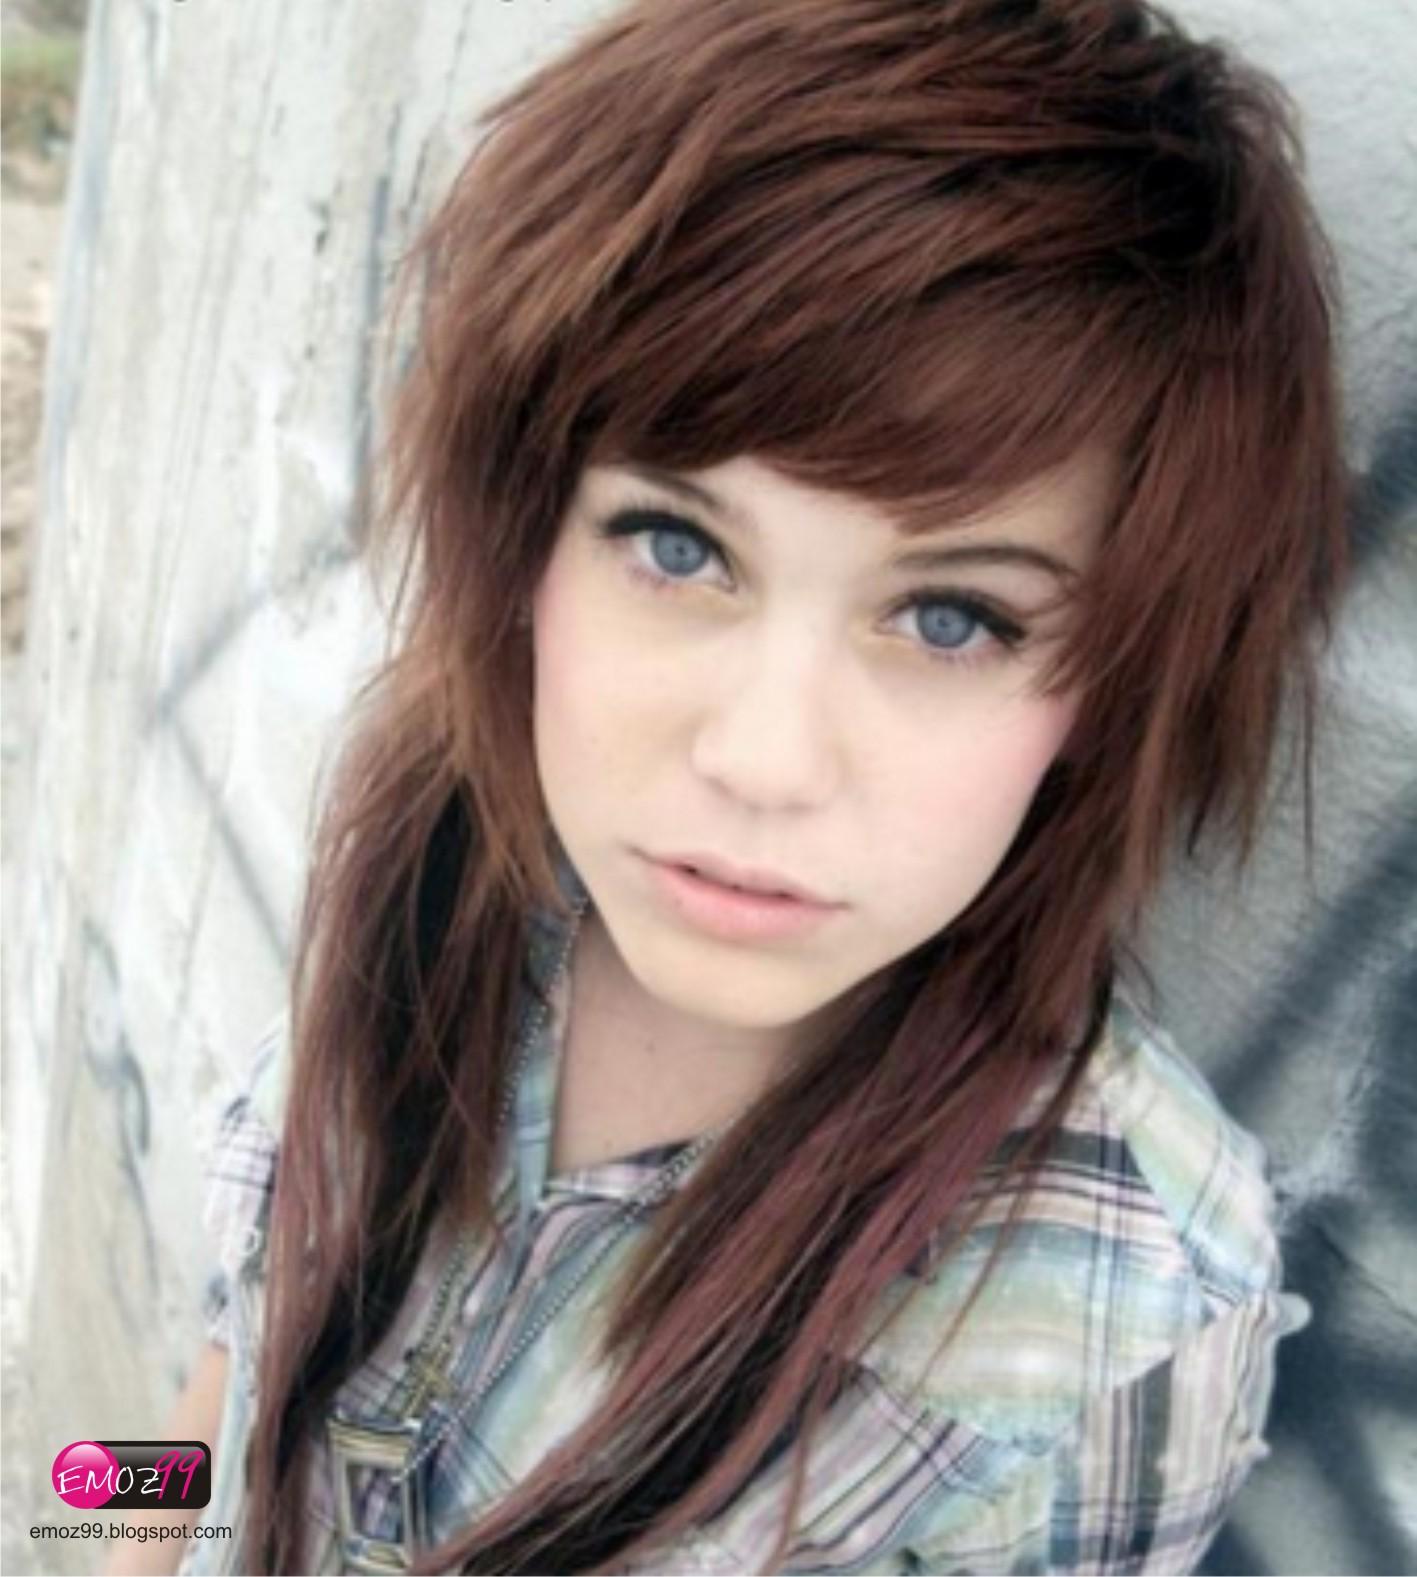 Emo's World: Cute Emo Girl # 11